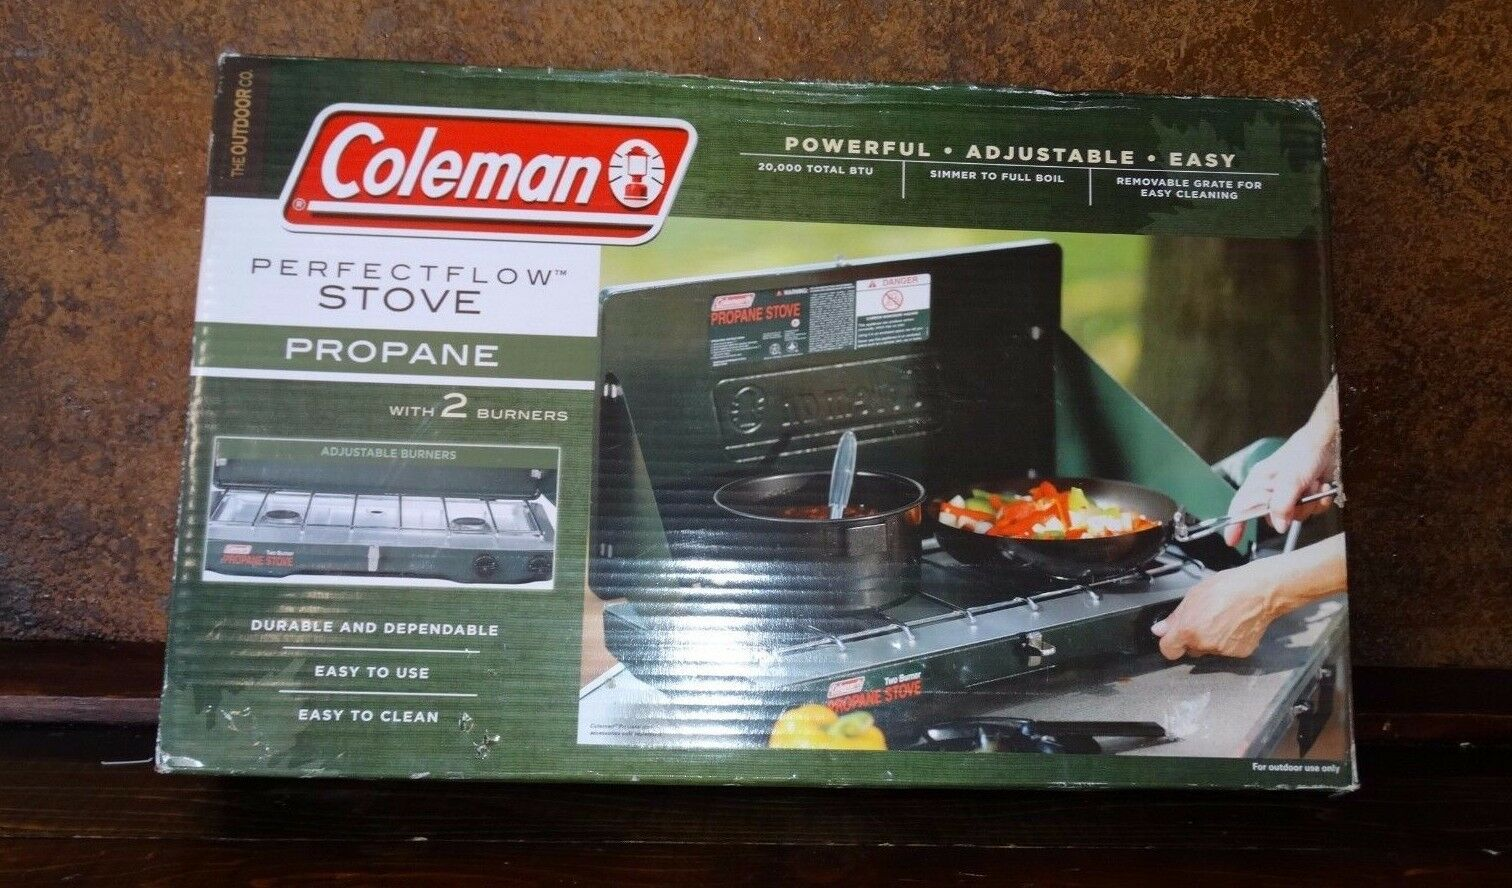 19173 NEW in BOX Coleman 2 Burner Propane STOVE  Portable Camping 20,000 btu